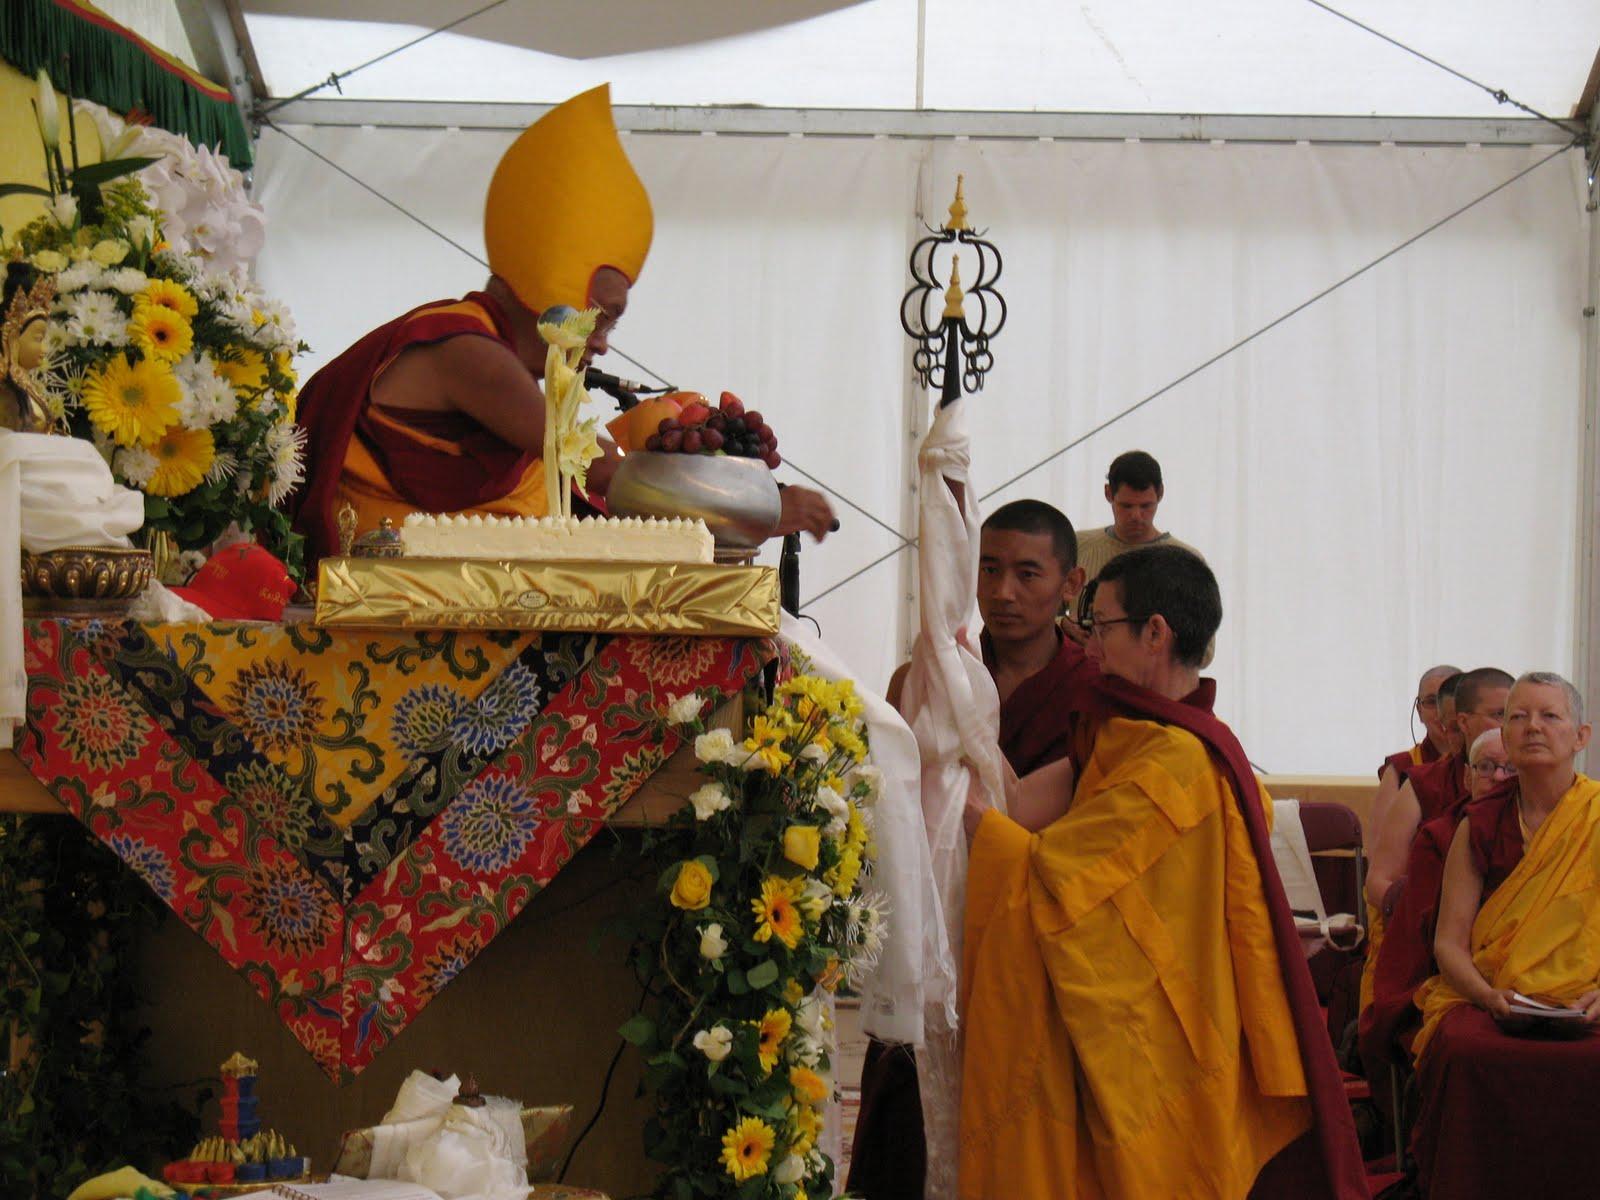 Ven. Kaye Miner offering monks staff during longLifepujaofferedtoLamaZopaRinpocheaftertheCPMTMeetingatInstitutVajraYogini,France, May2009.